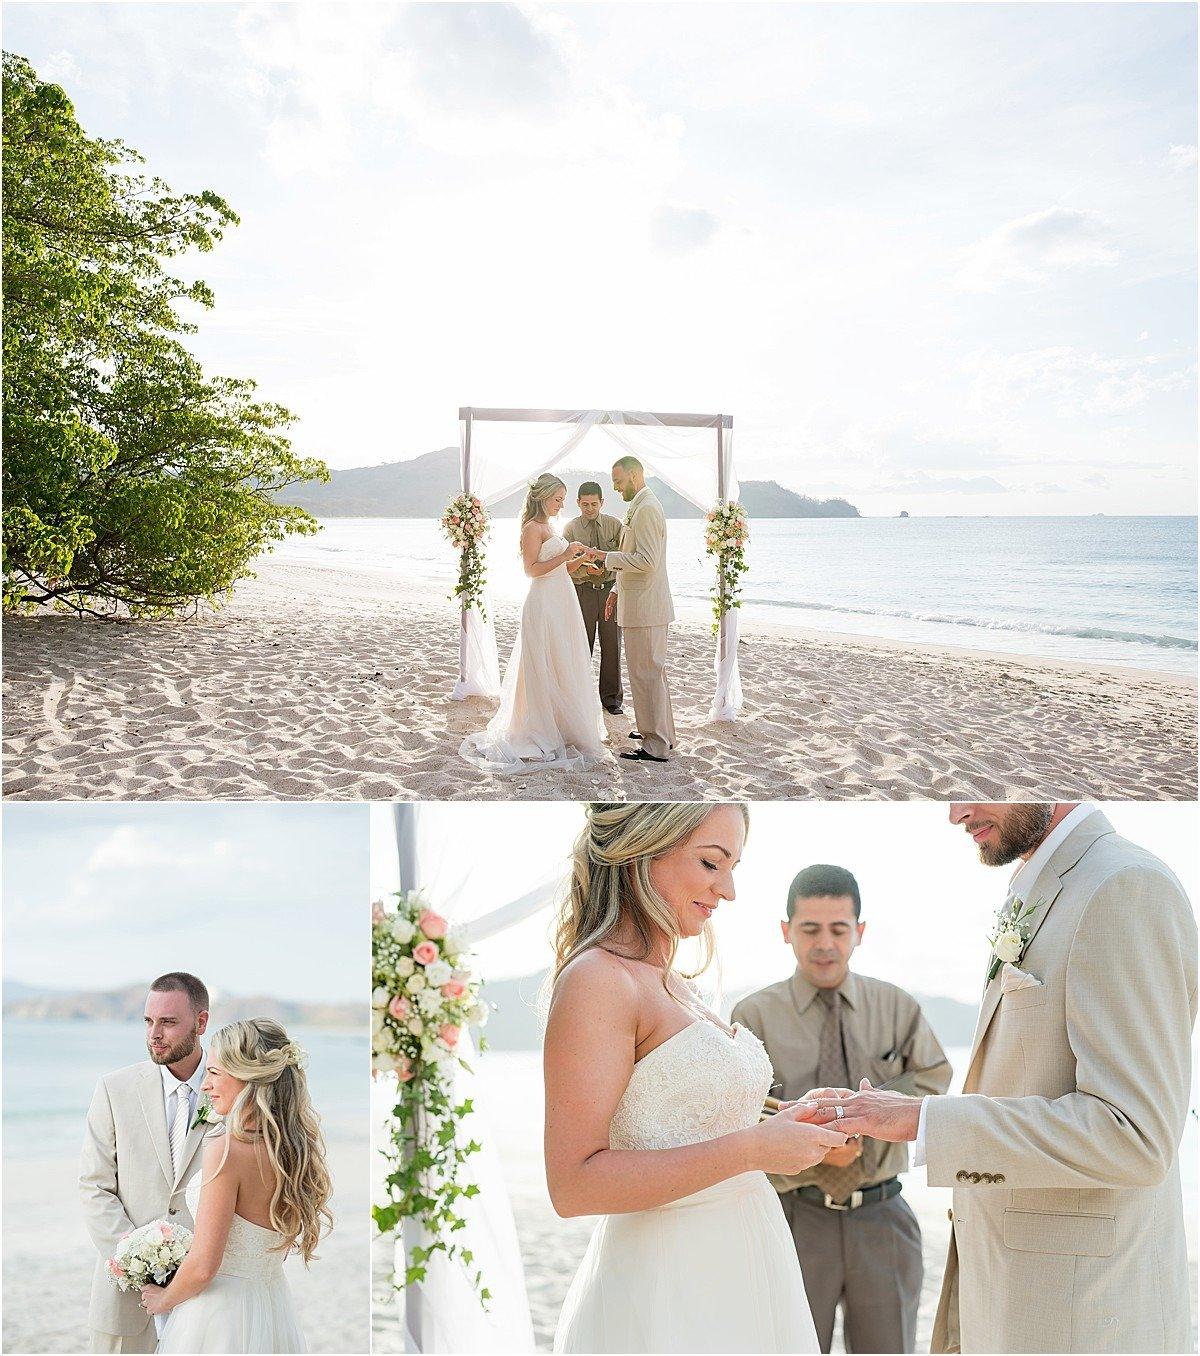 offciant in Costa Rica elope